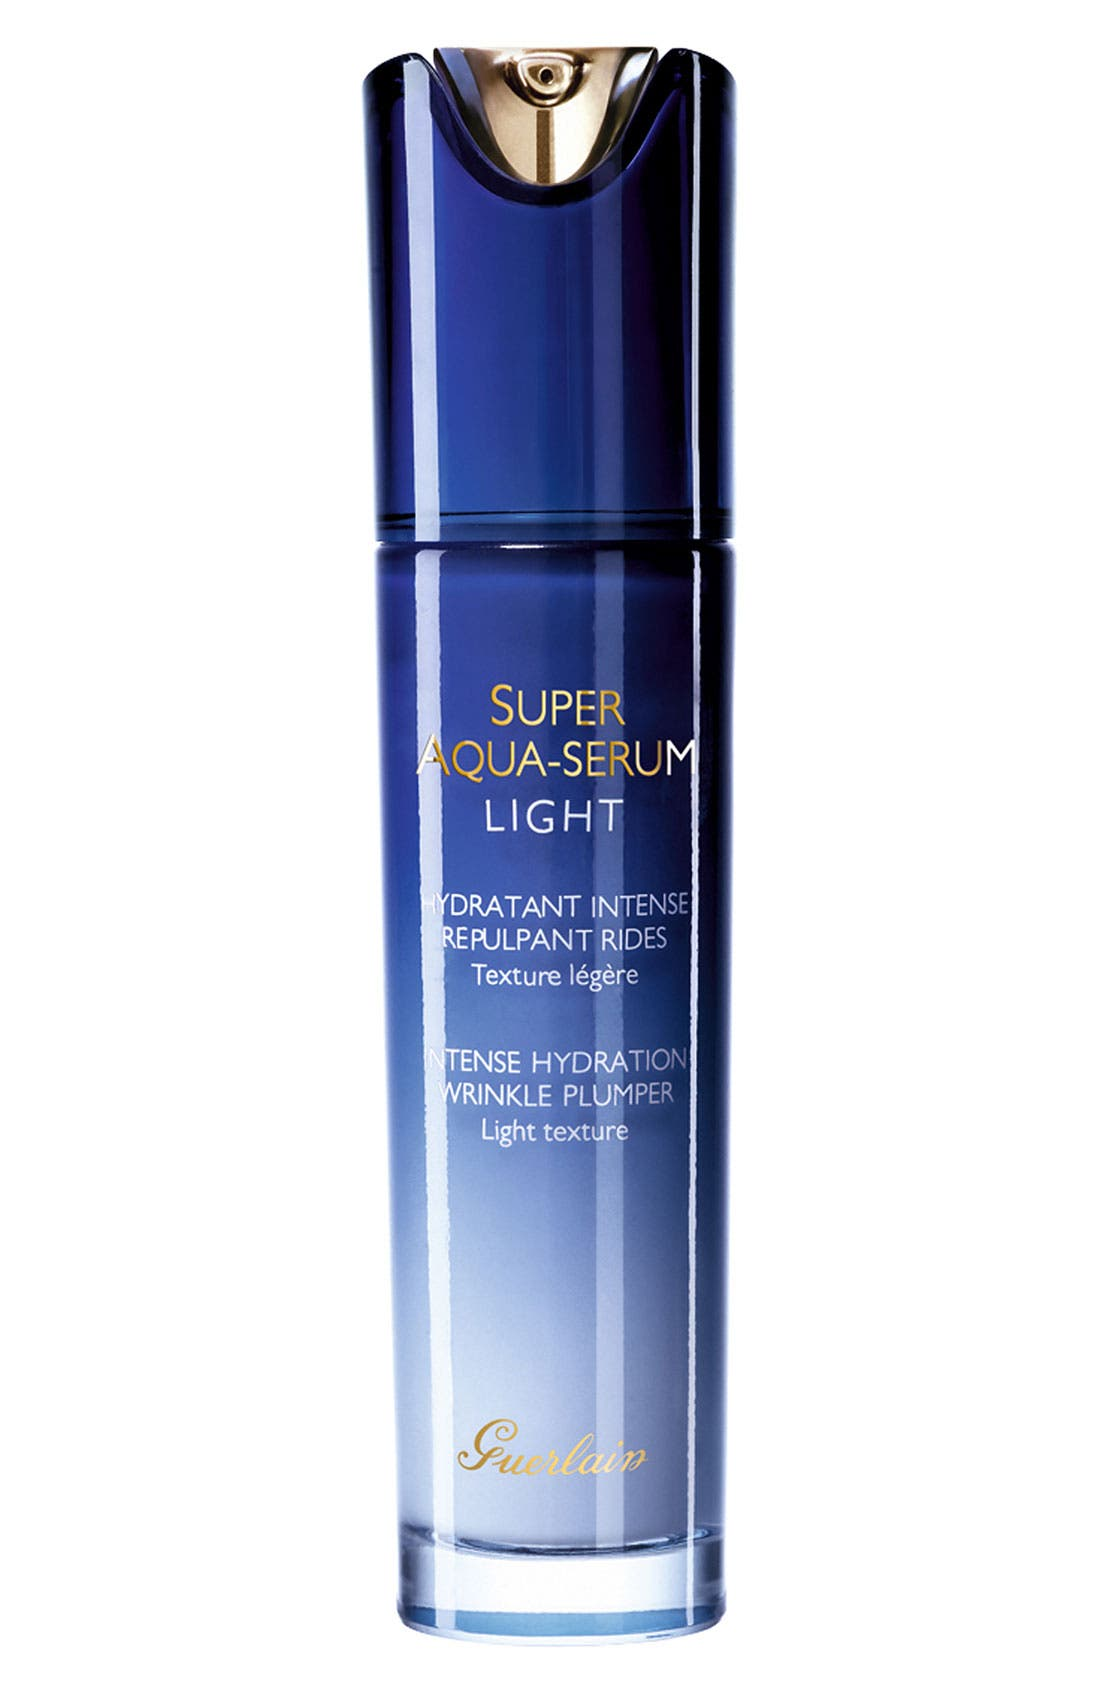 Guerlain 'Super Aqua-Serum Light' Wrinkle Plumper